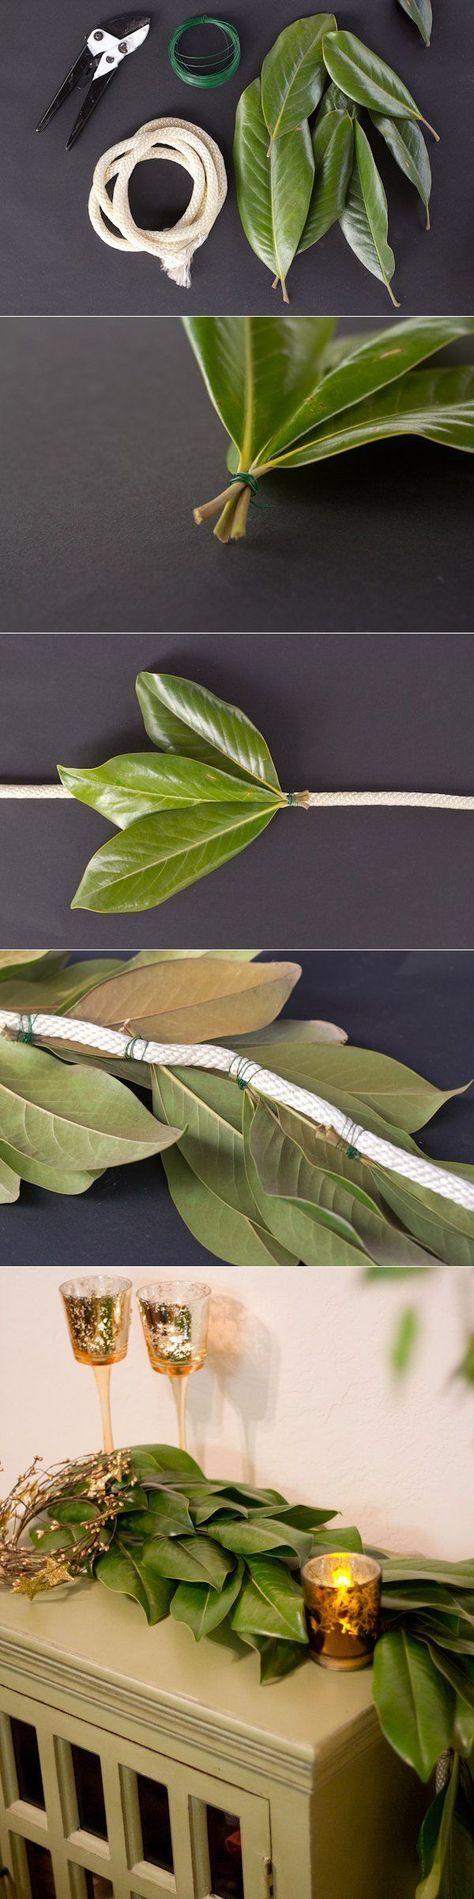 DIY Magnolia Leaf Garland - The Sweetest Occasion